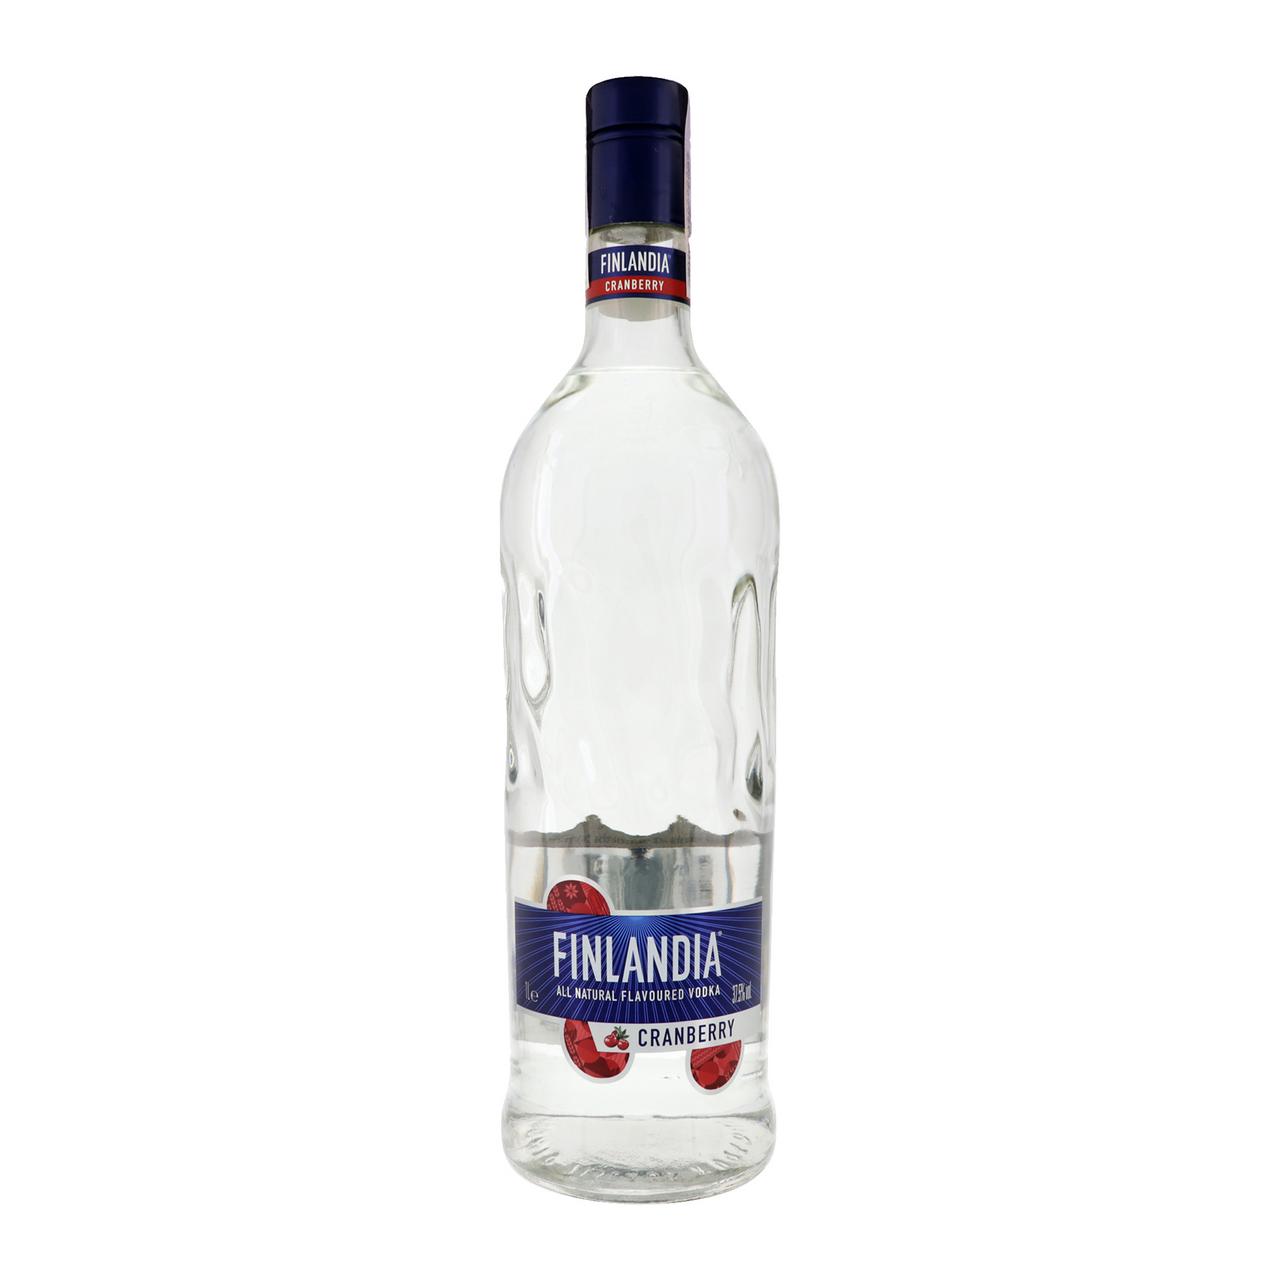 Горілка Finlandia Cranberry біла 37,5% 1л